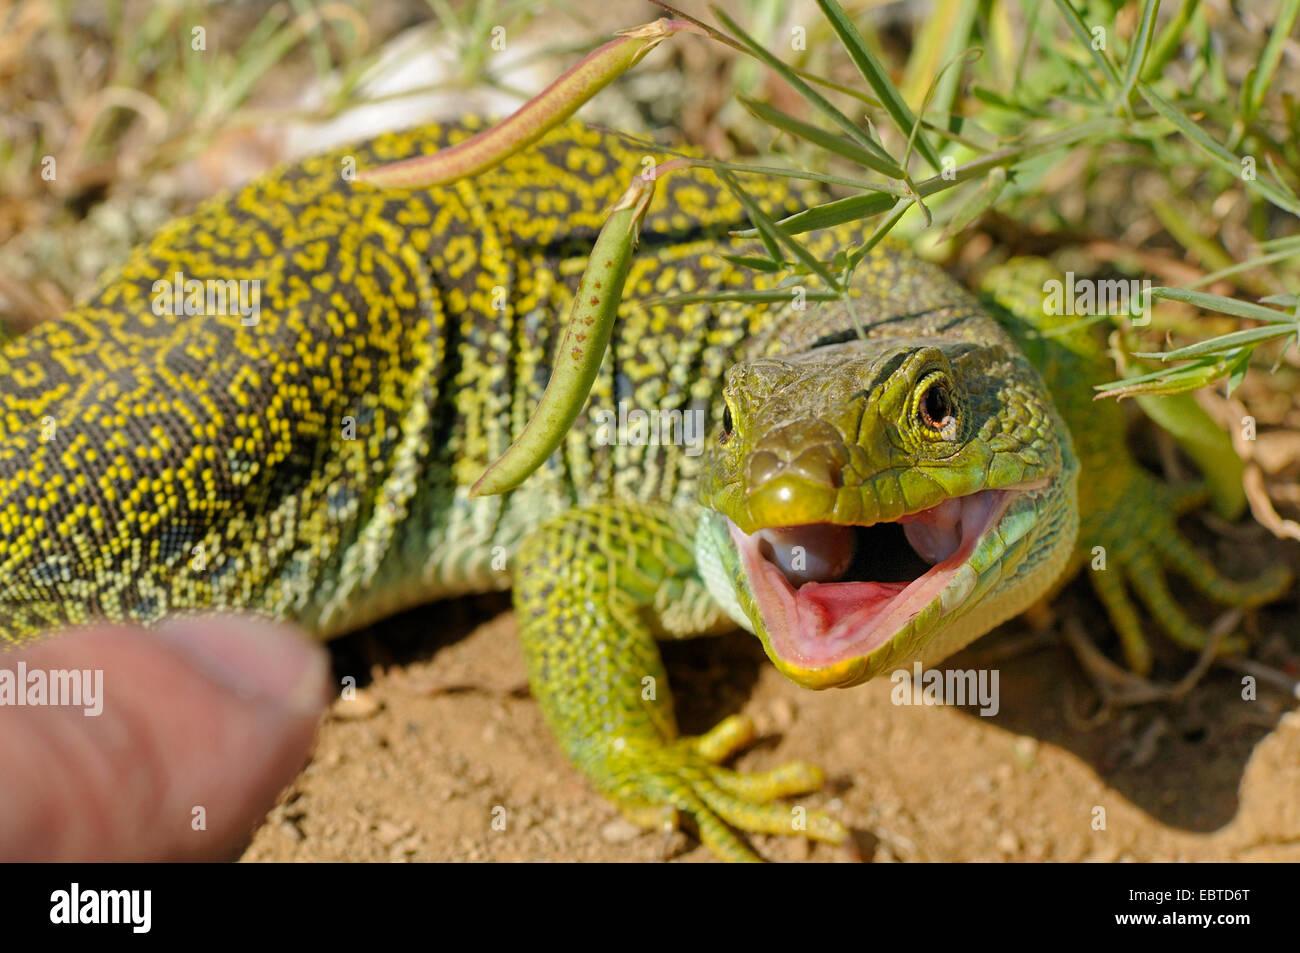 ocellated lizard, ocellated green lizard, eyed lizard, jewelled lizard (Lacerta lepida), lizard being teased with - Stock Image